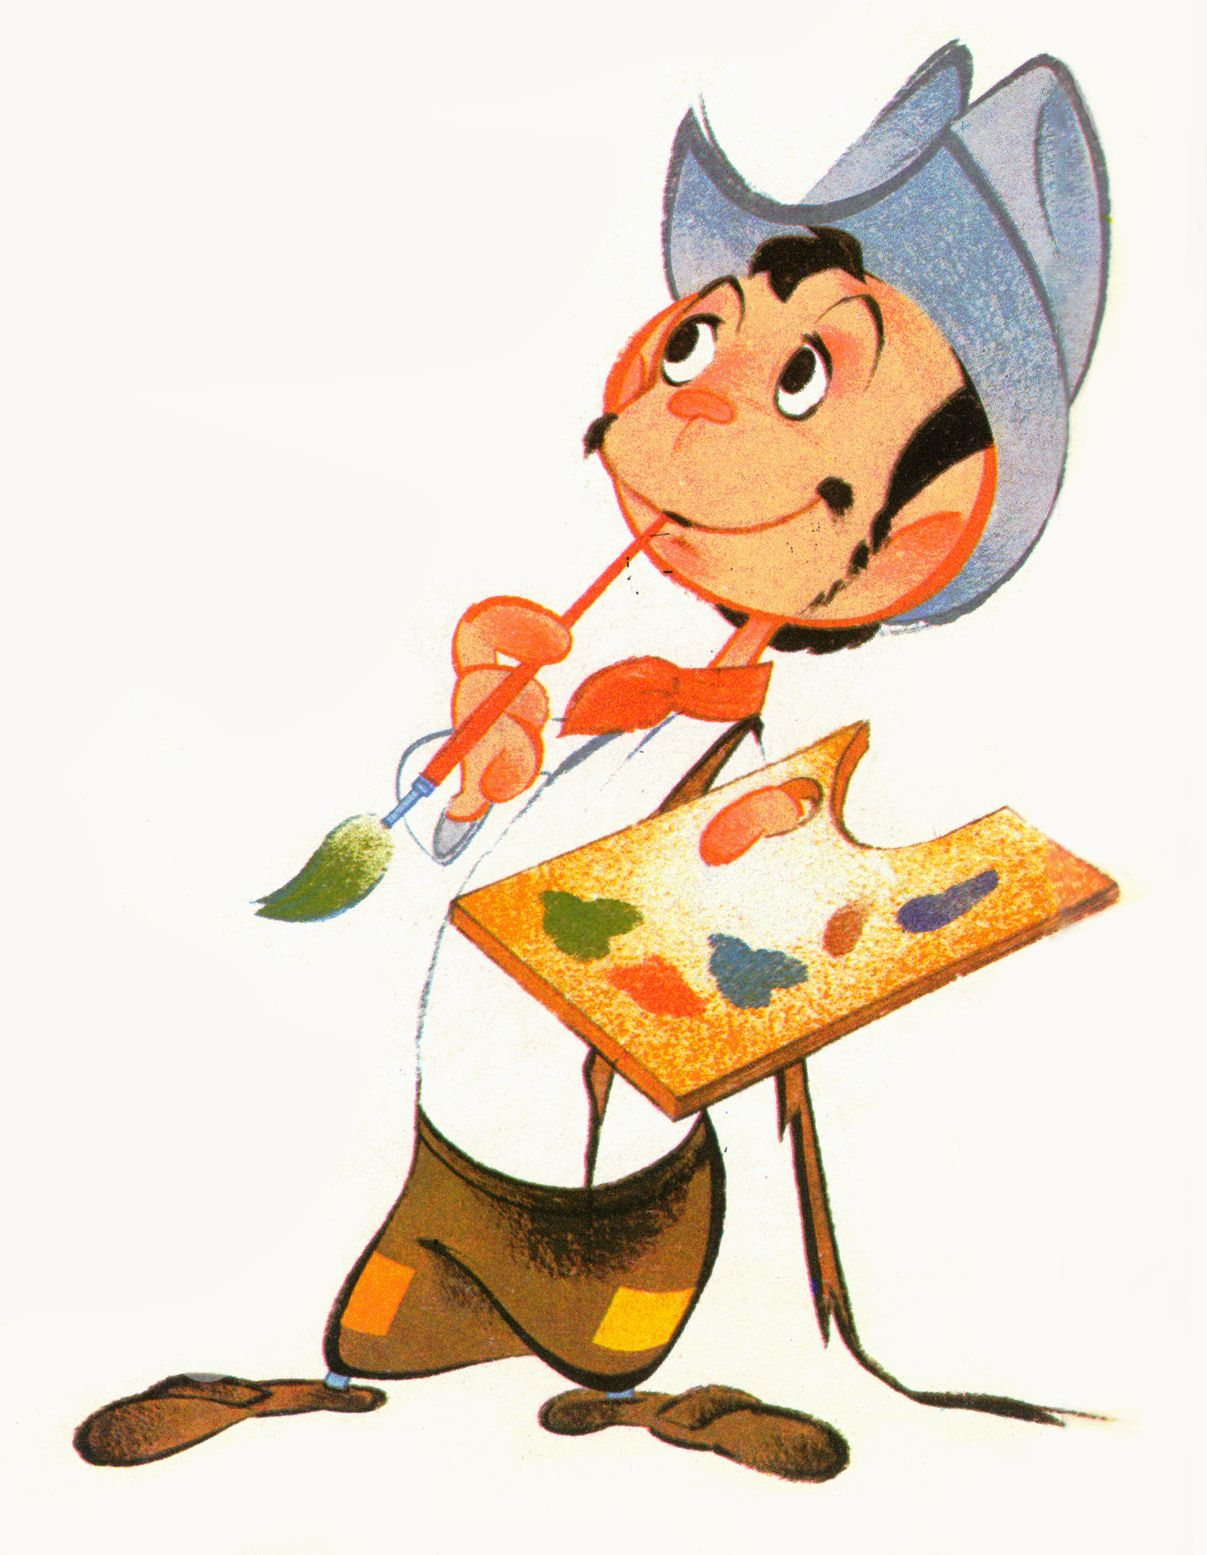 1207x1555 El Arte De Cantinflas Show Leonardo Davinci 21, 22, 23